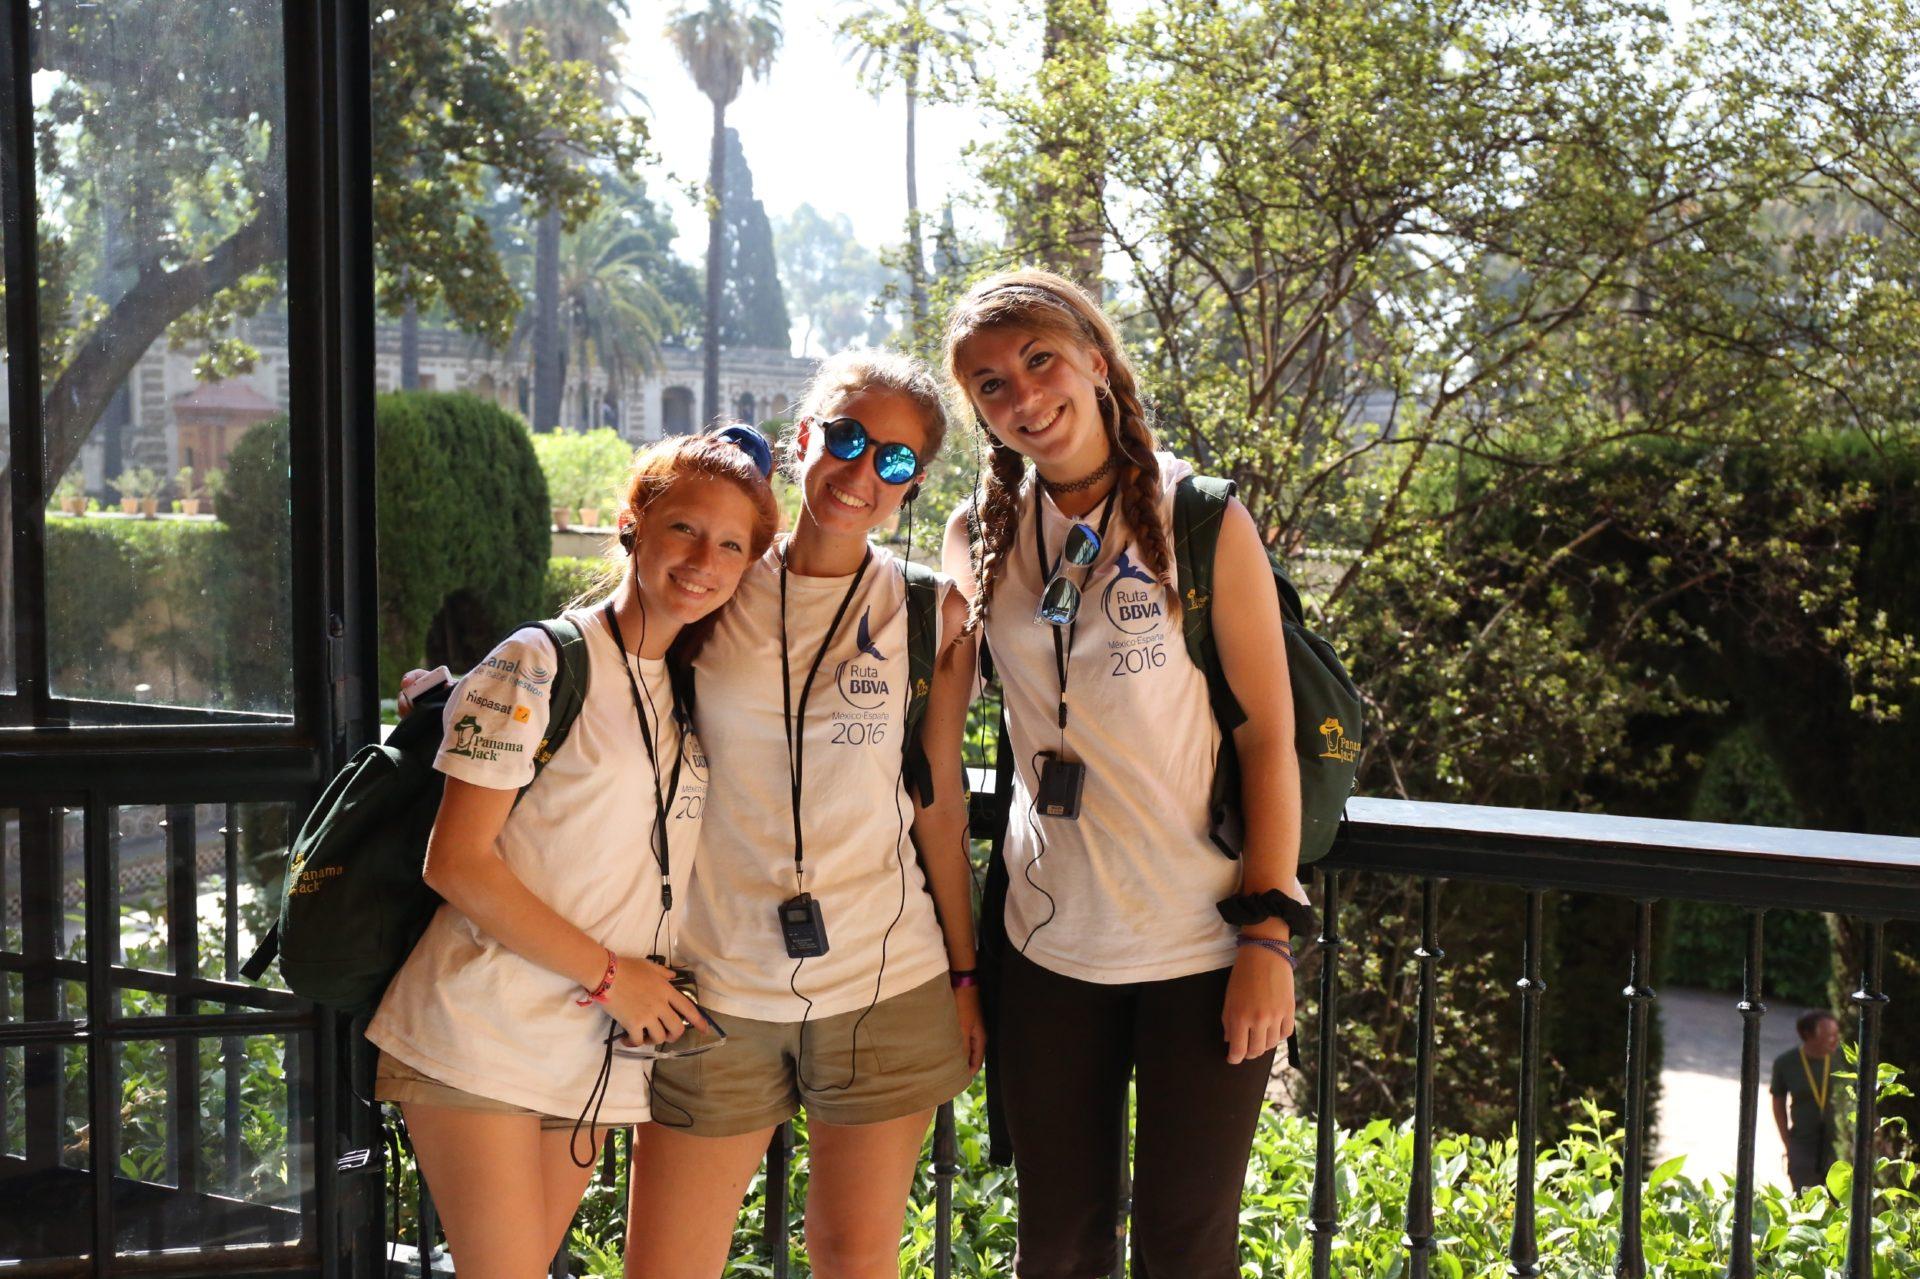 Expedicionarias de la Ruta BBVA en el Real Alcázar de Sevilla